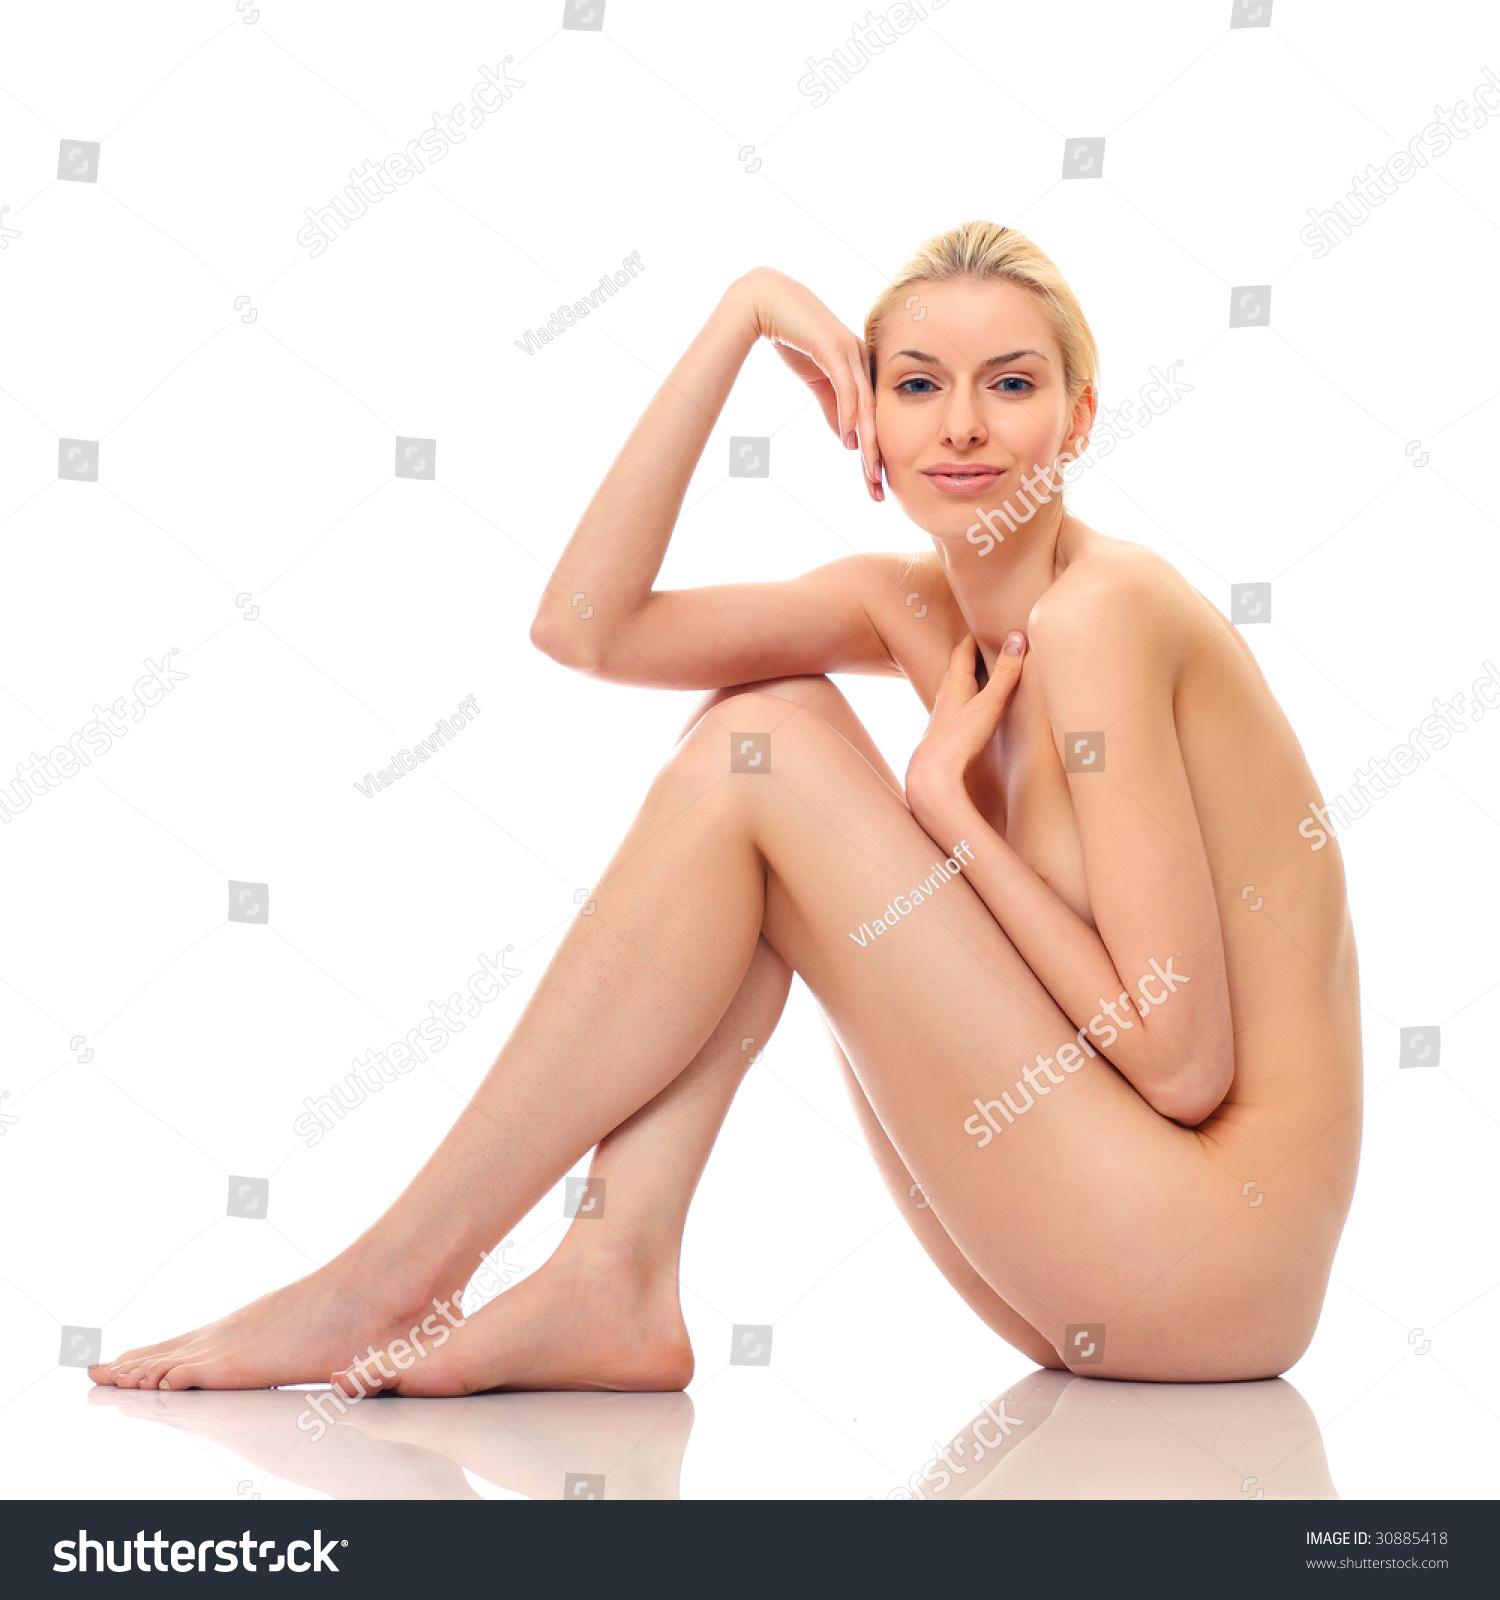 Beautiful naked poses